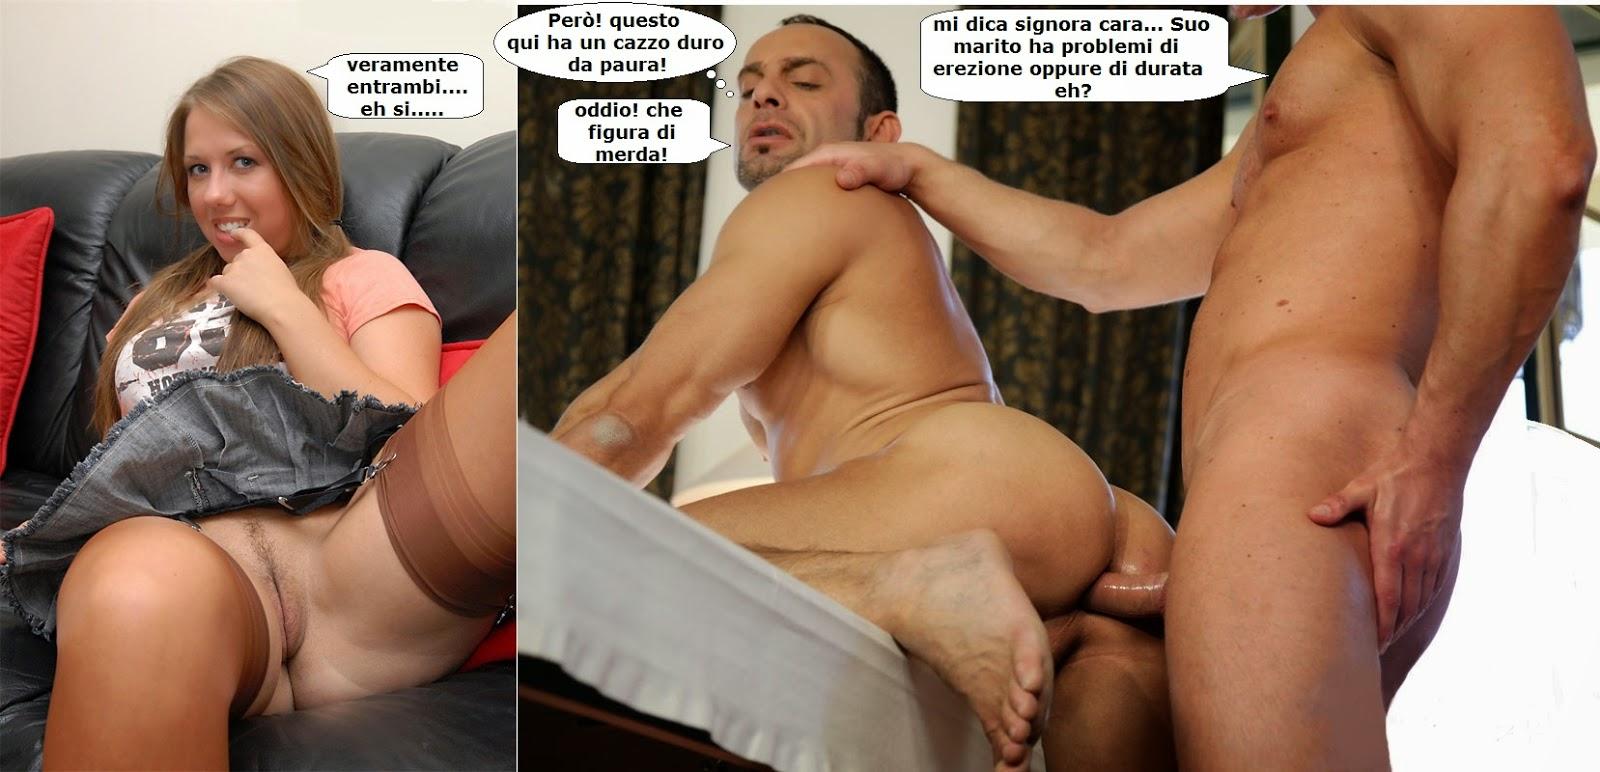 racconti gay illustrati Monza